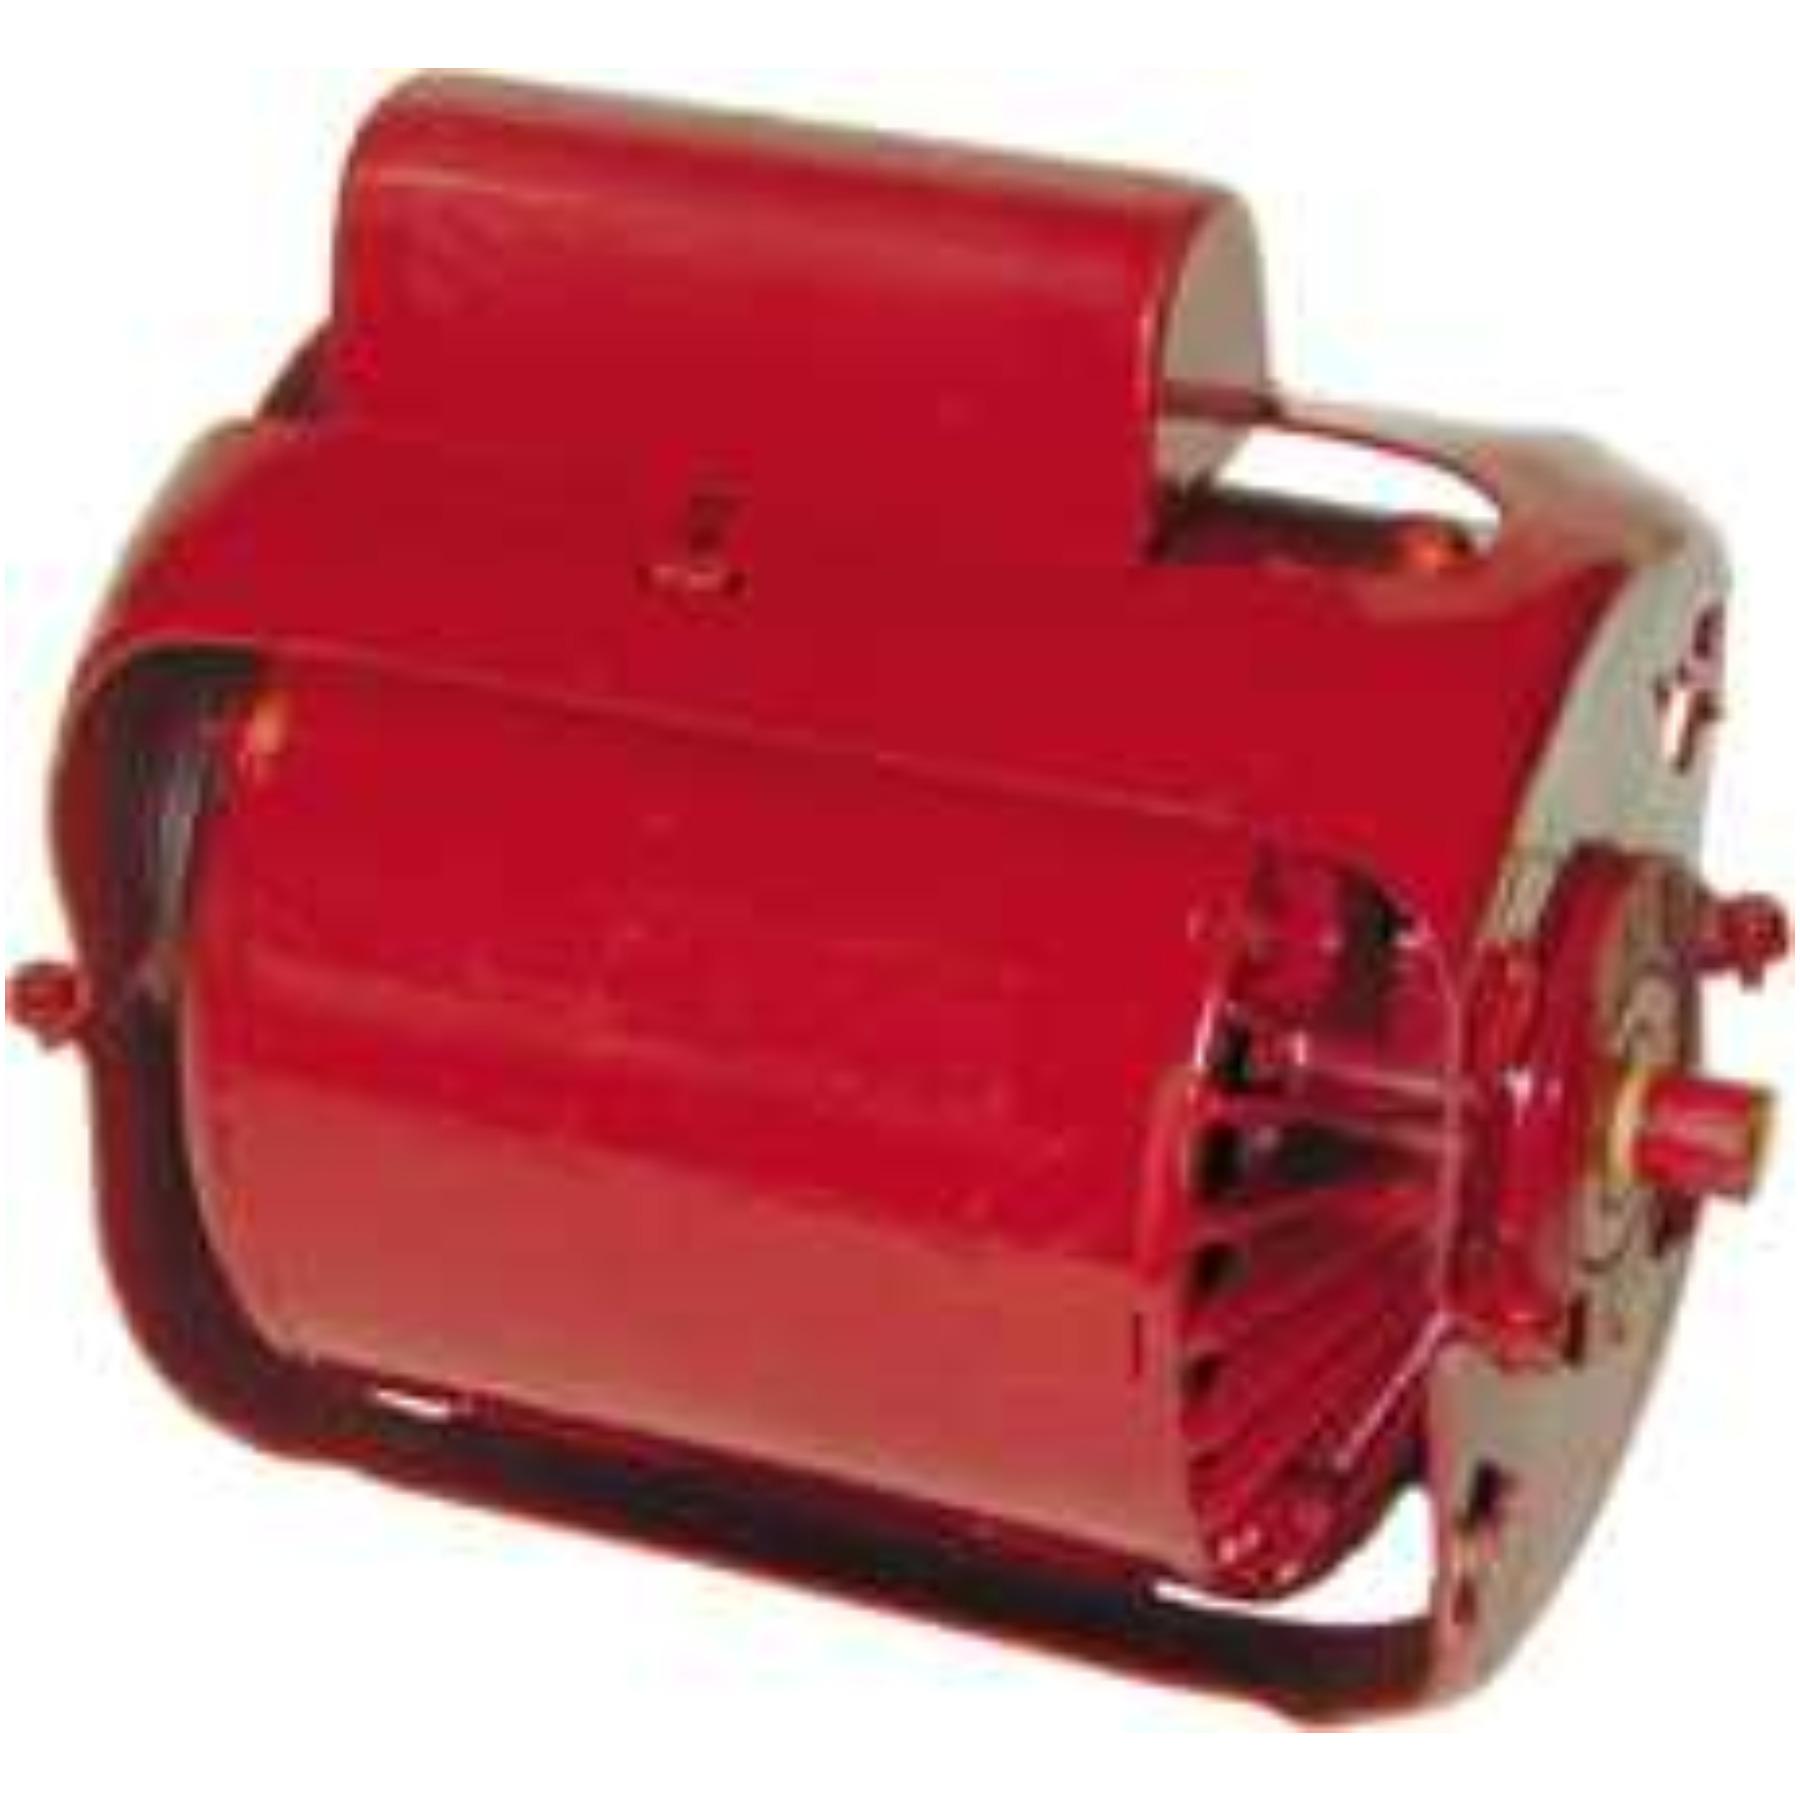 "BELL & GOSSETT 111061 POWER PACK 115 VOLT 1/6 HP FOR BOOSTER PUMPS 5"" BRACKET 4.125"" BOLT PATTERN"